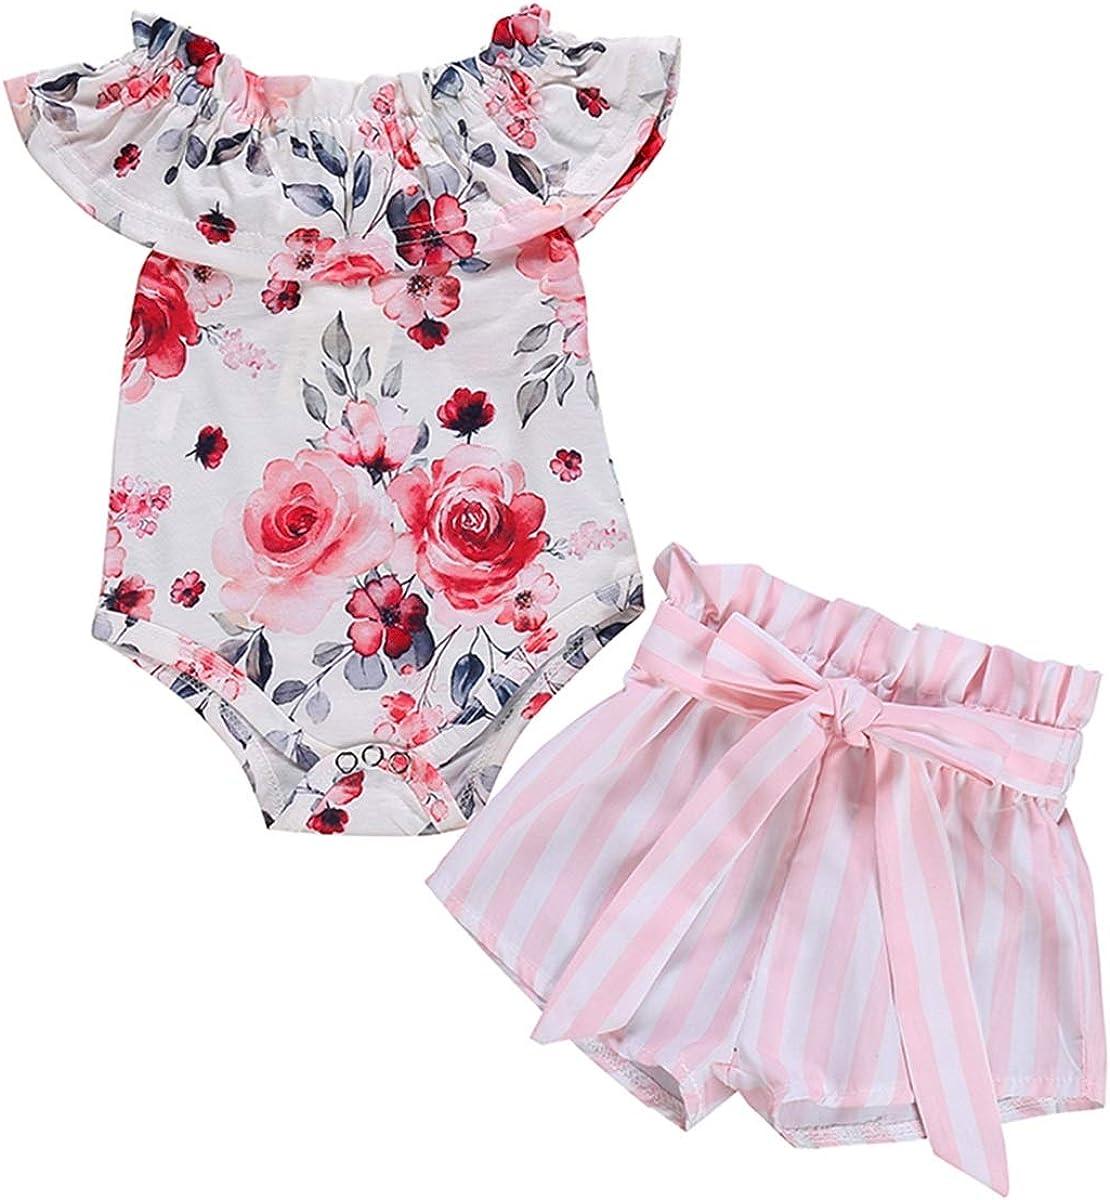 Puseky 2 Pezzi//Set Neonato Bambina arruffata Rosa Pagliaccetto Stampato Pantaloncini a Righe Pantaloni Abiti Set